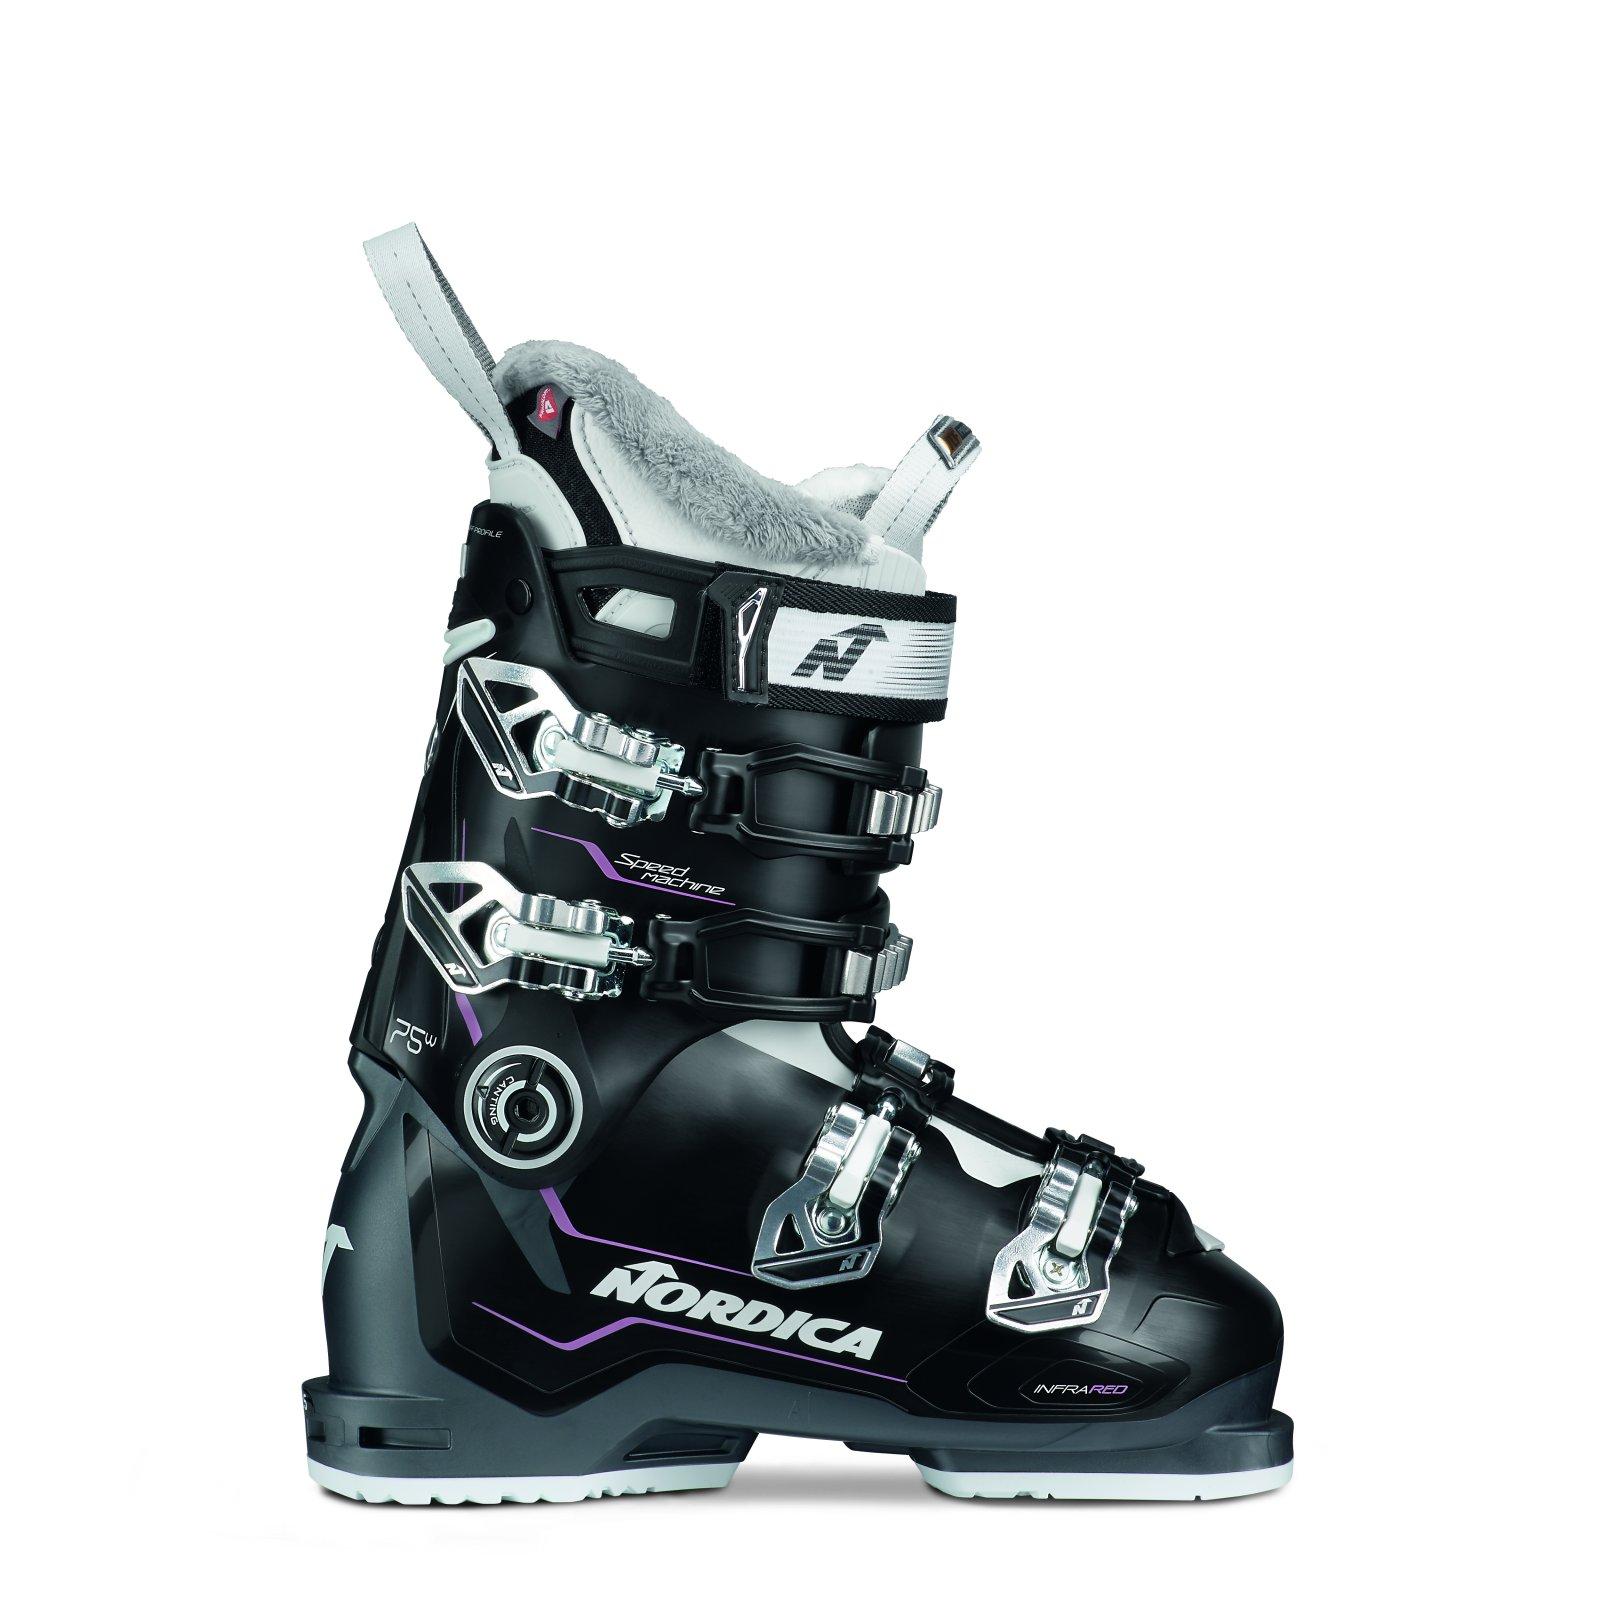 2022 Nordica Speedmachine 75 Women's Ski Boots